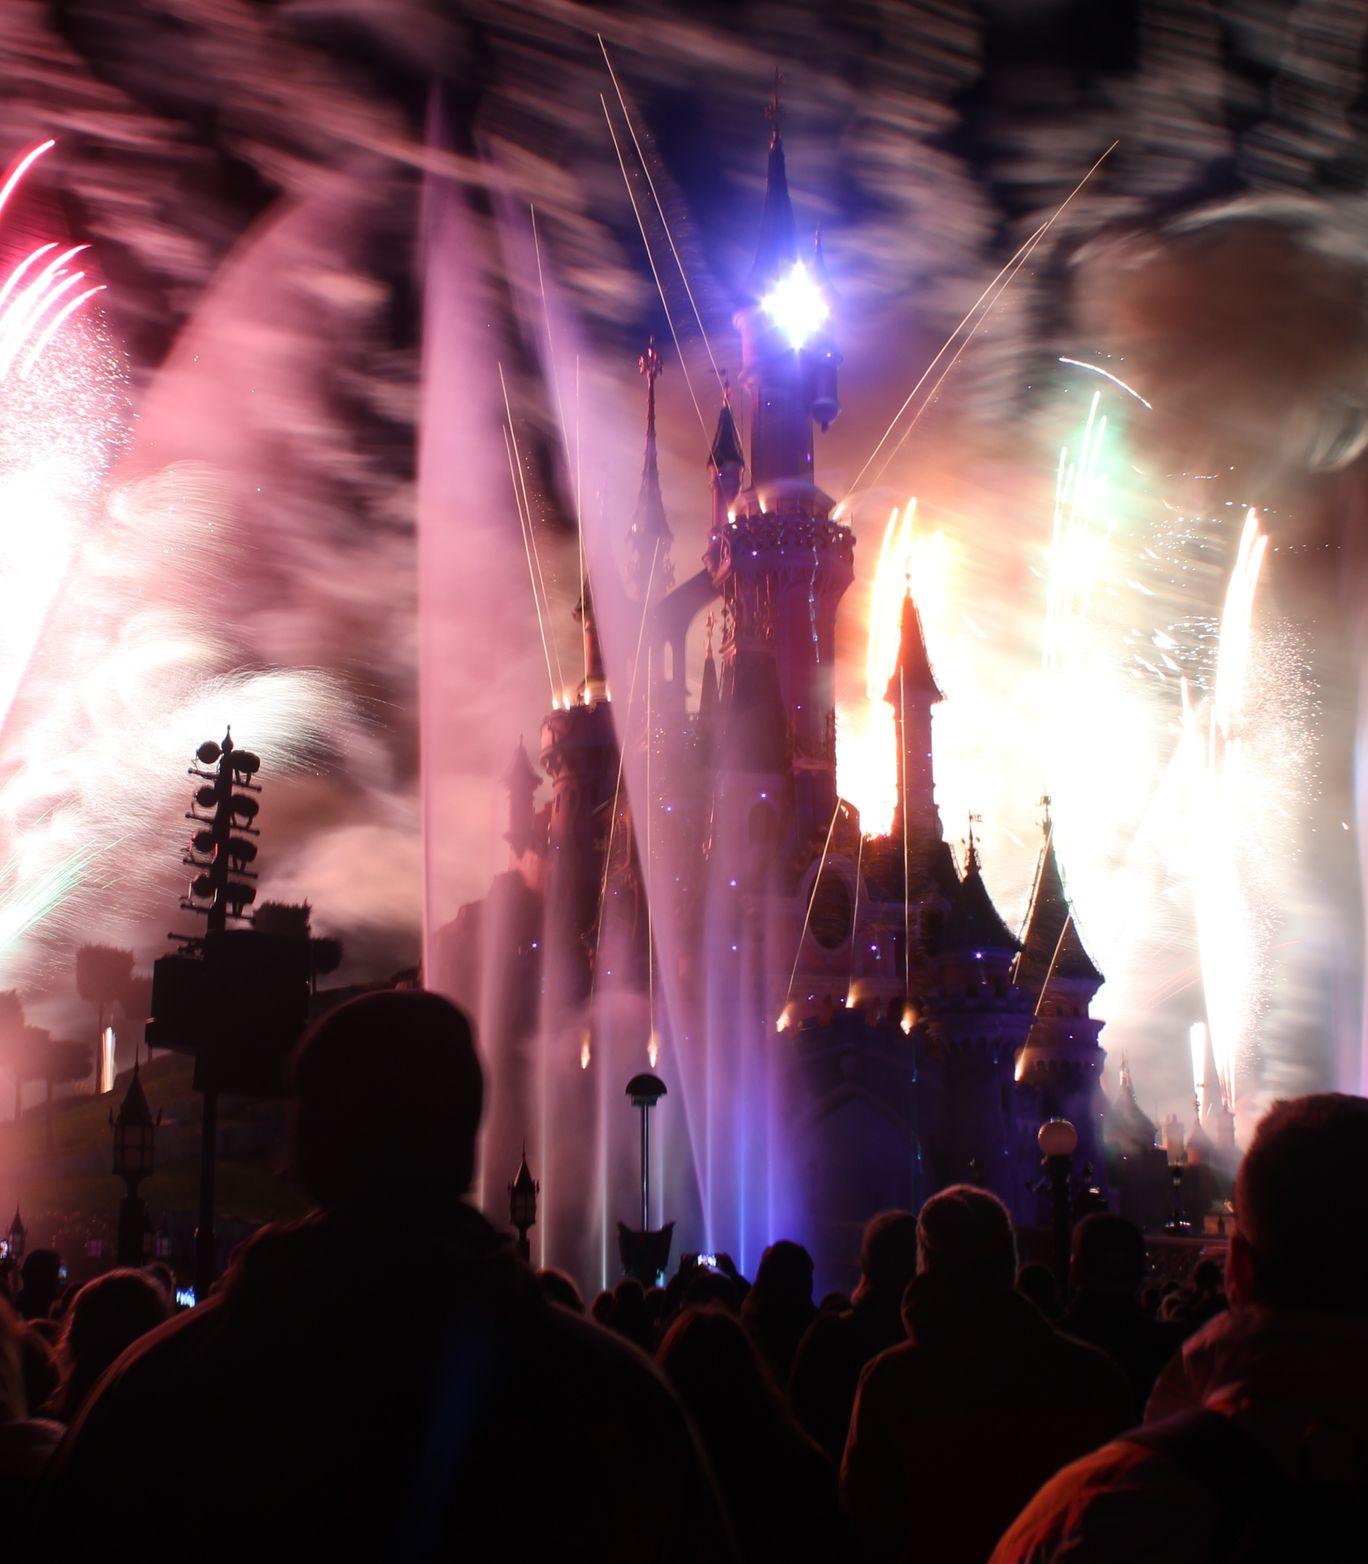 Photo of Disneyland Paris By Abhishek Kishore